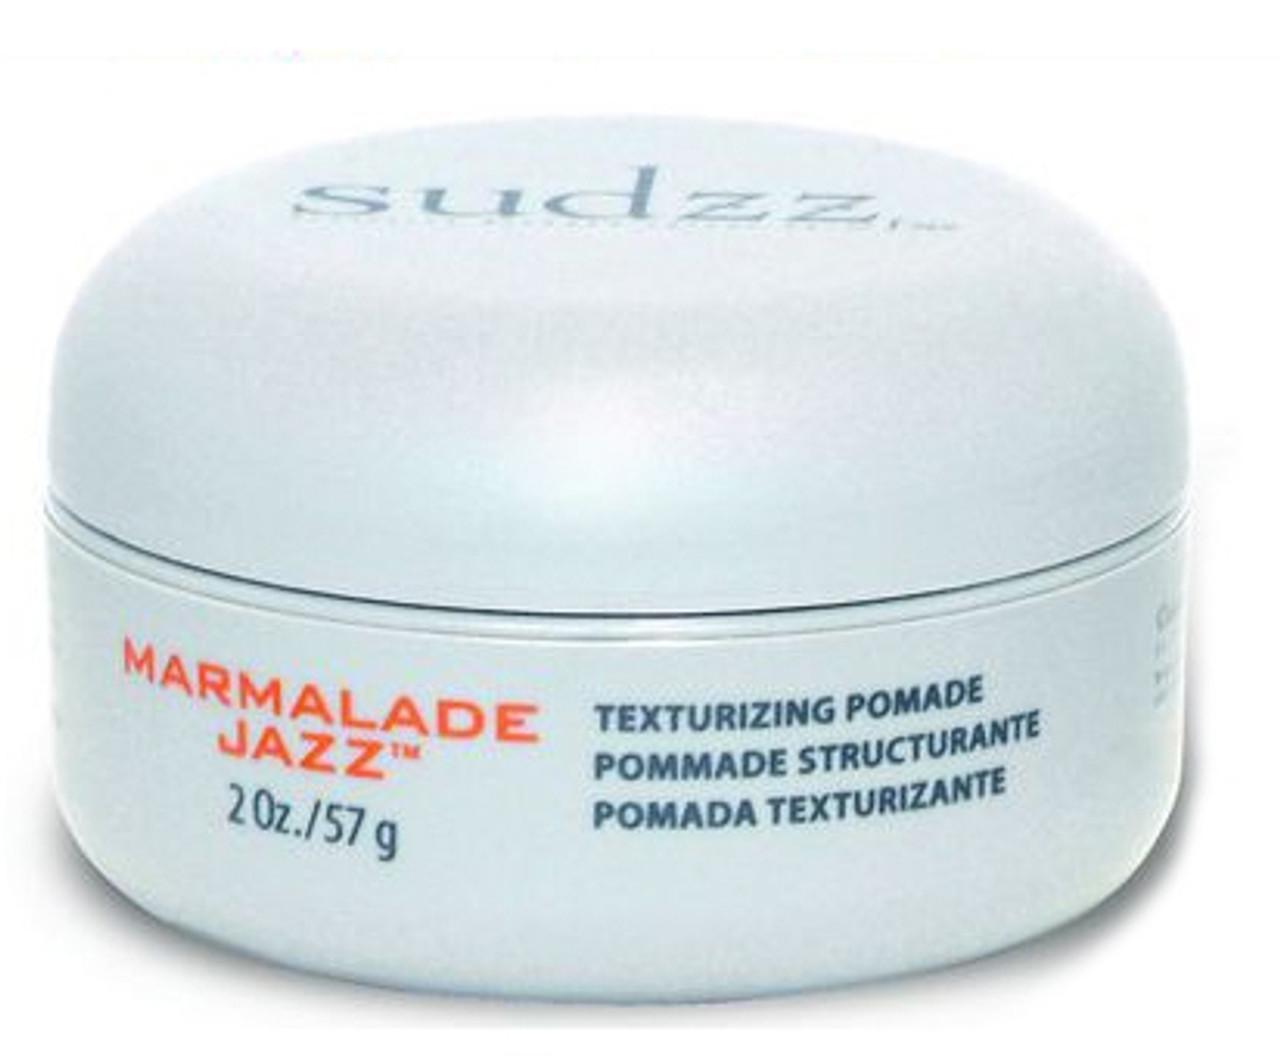 Sudzz Marmalade Jazz Texturizing Pomade